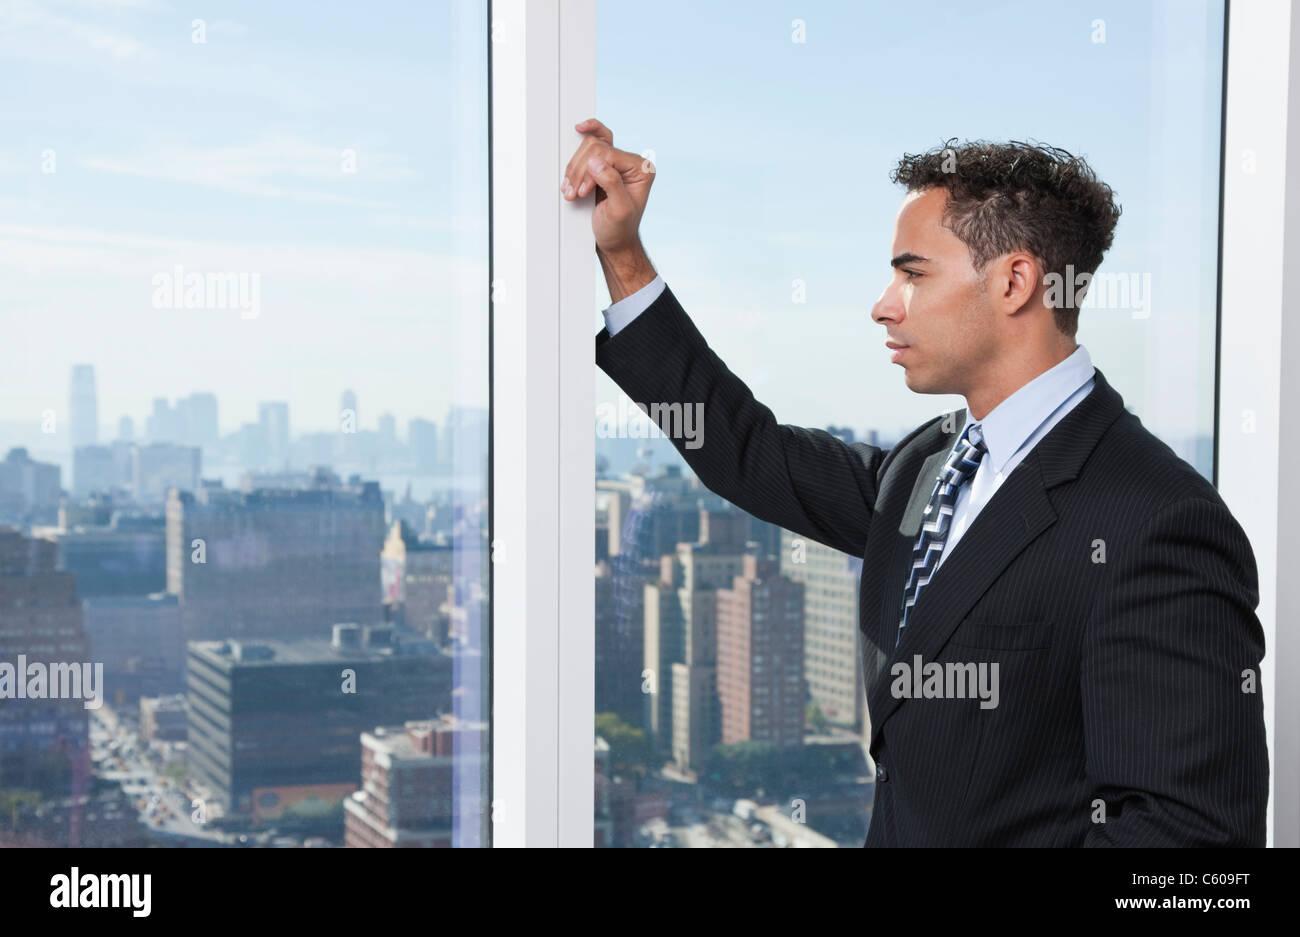 USA, New York State, New York City, business man looking through window - Stock Image